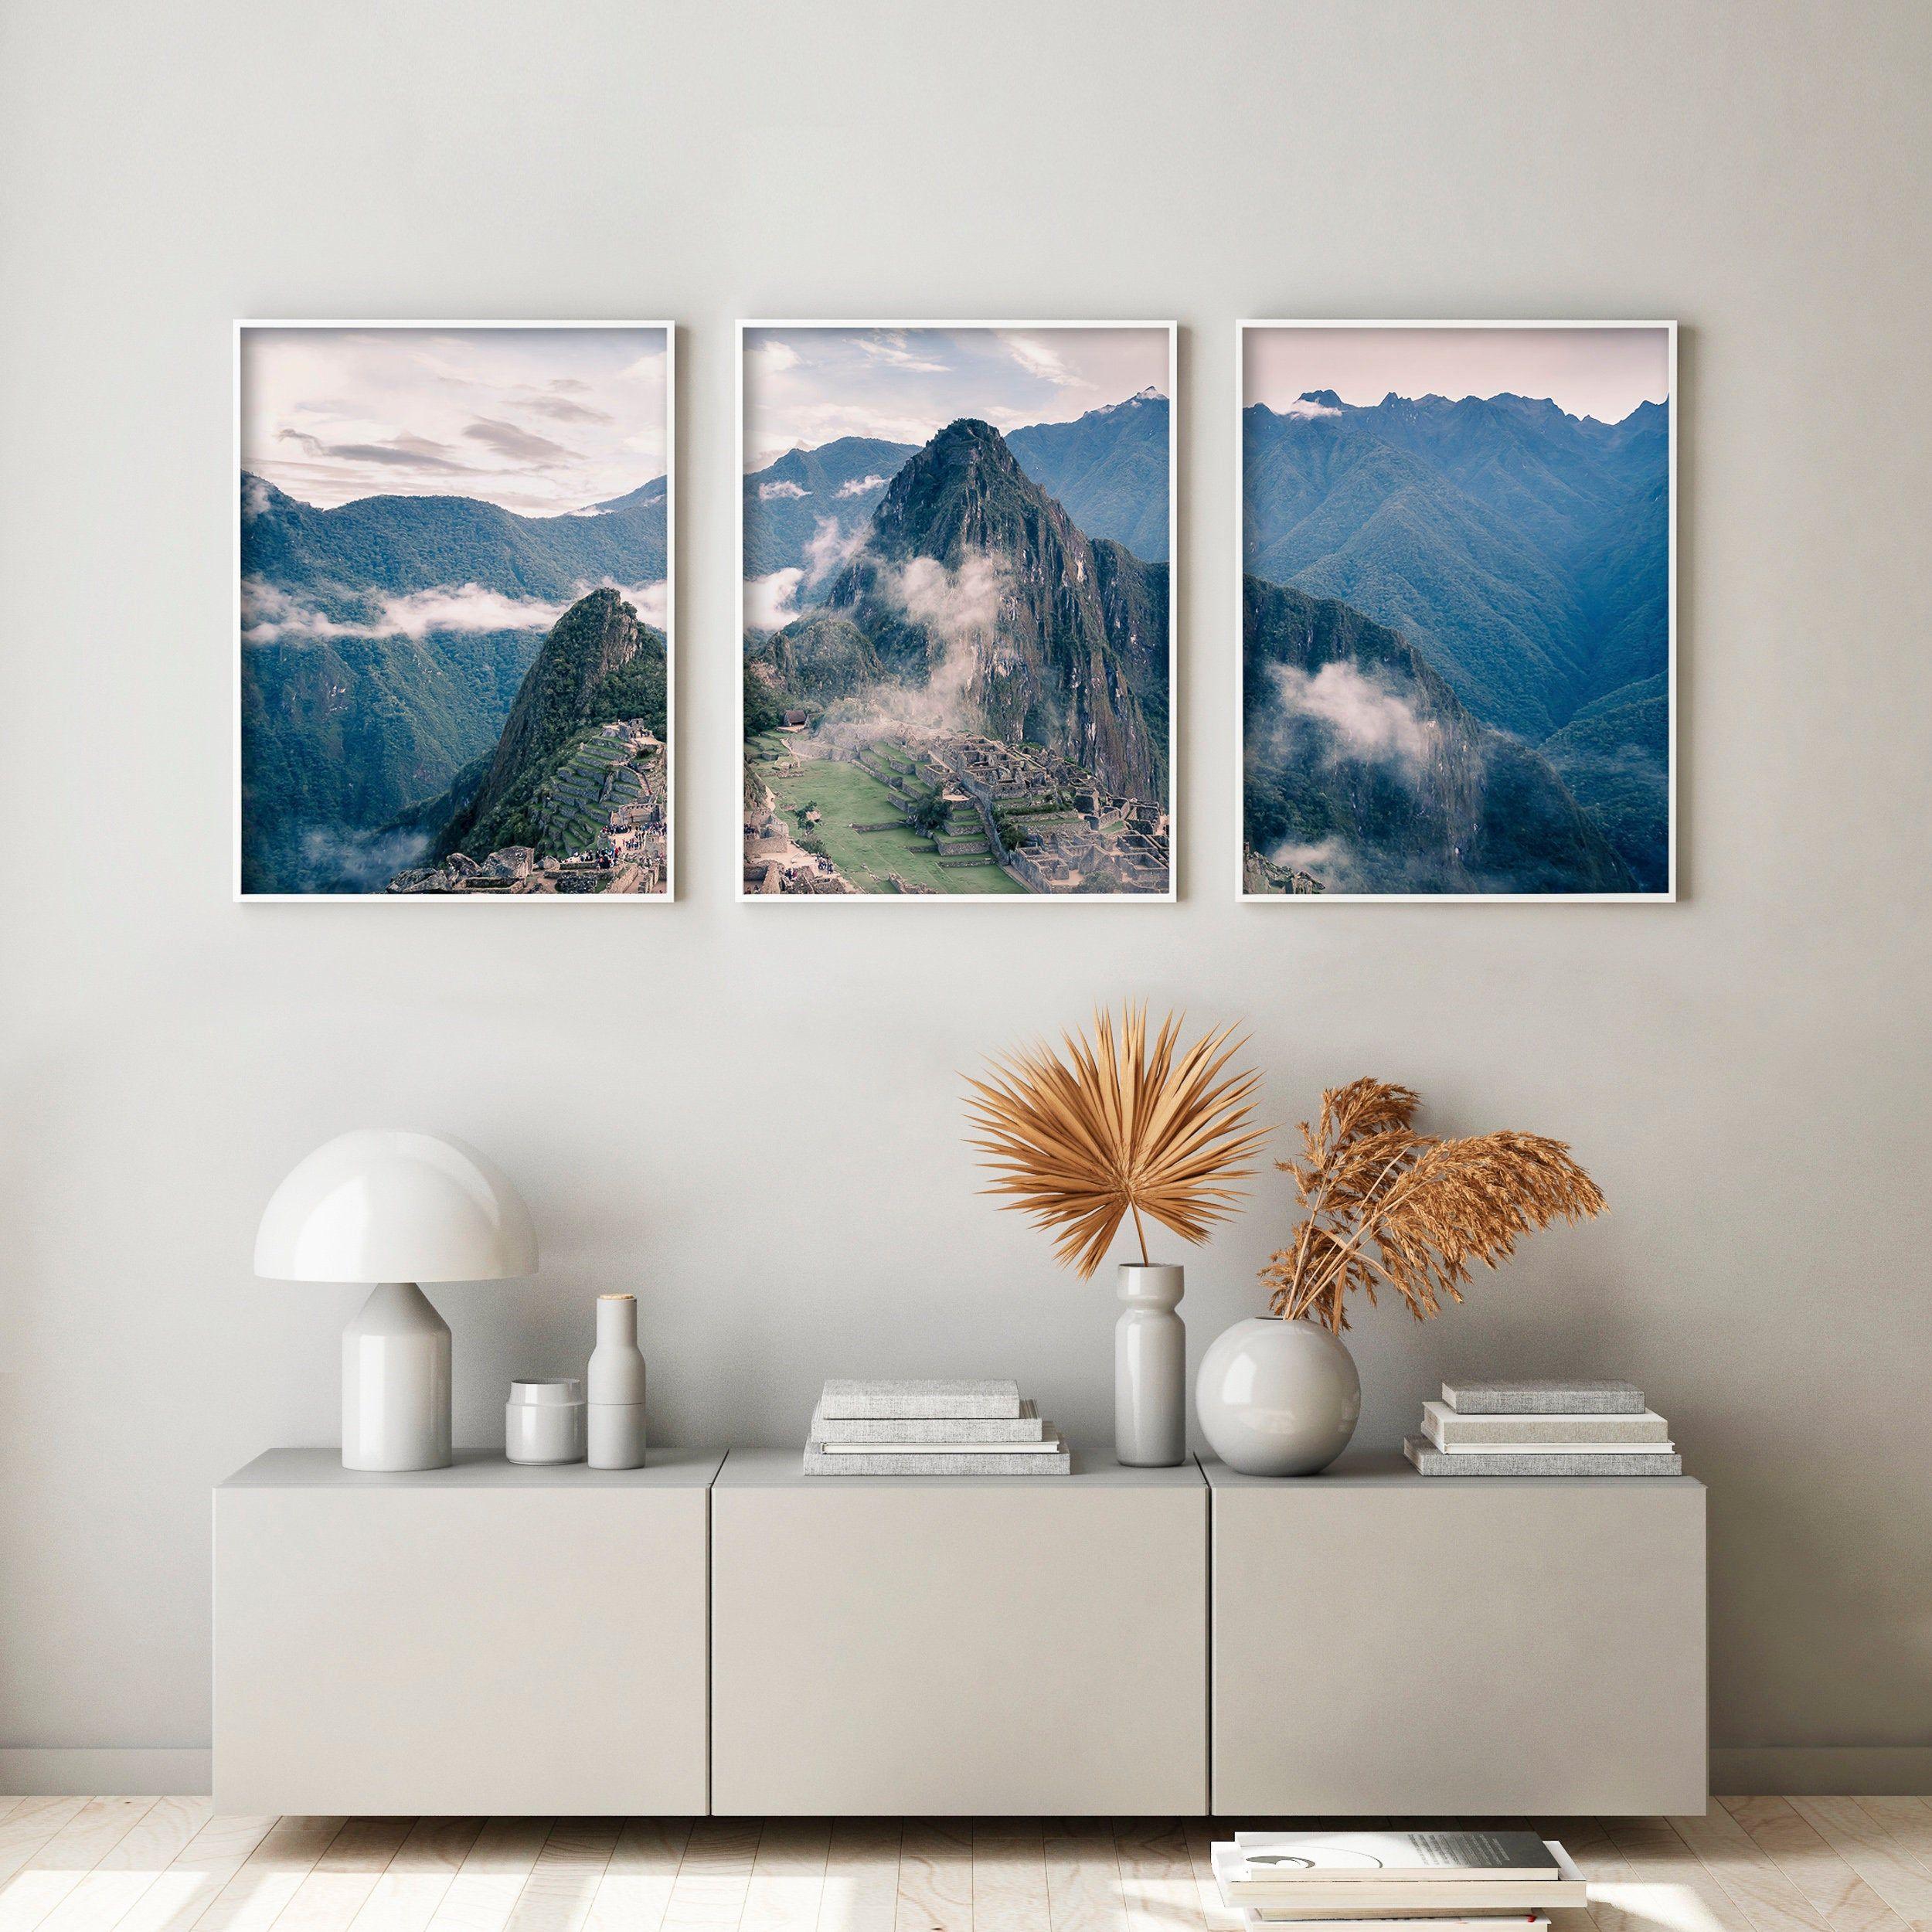 Machu Picchu Foggy Mountain Set Of 3 Landscape Huayna Picchu Etsy Photography Wall Art Poster Wall Art Photography Wall